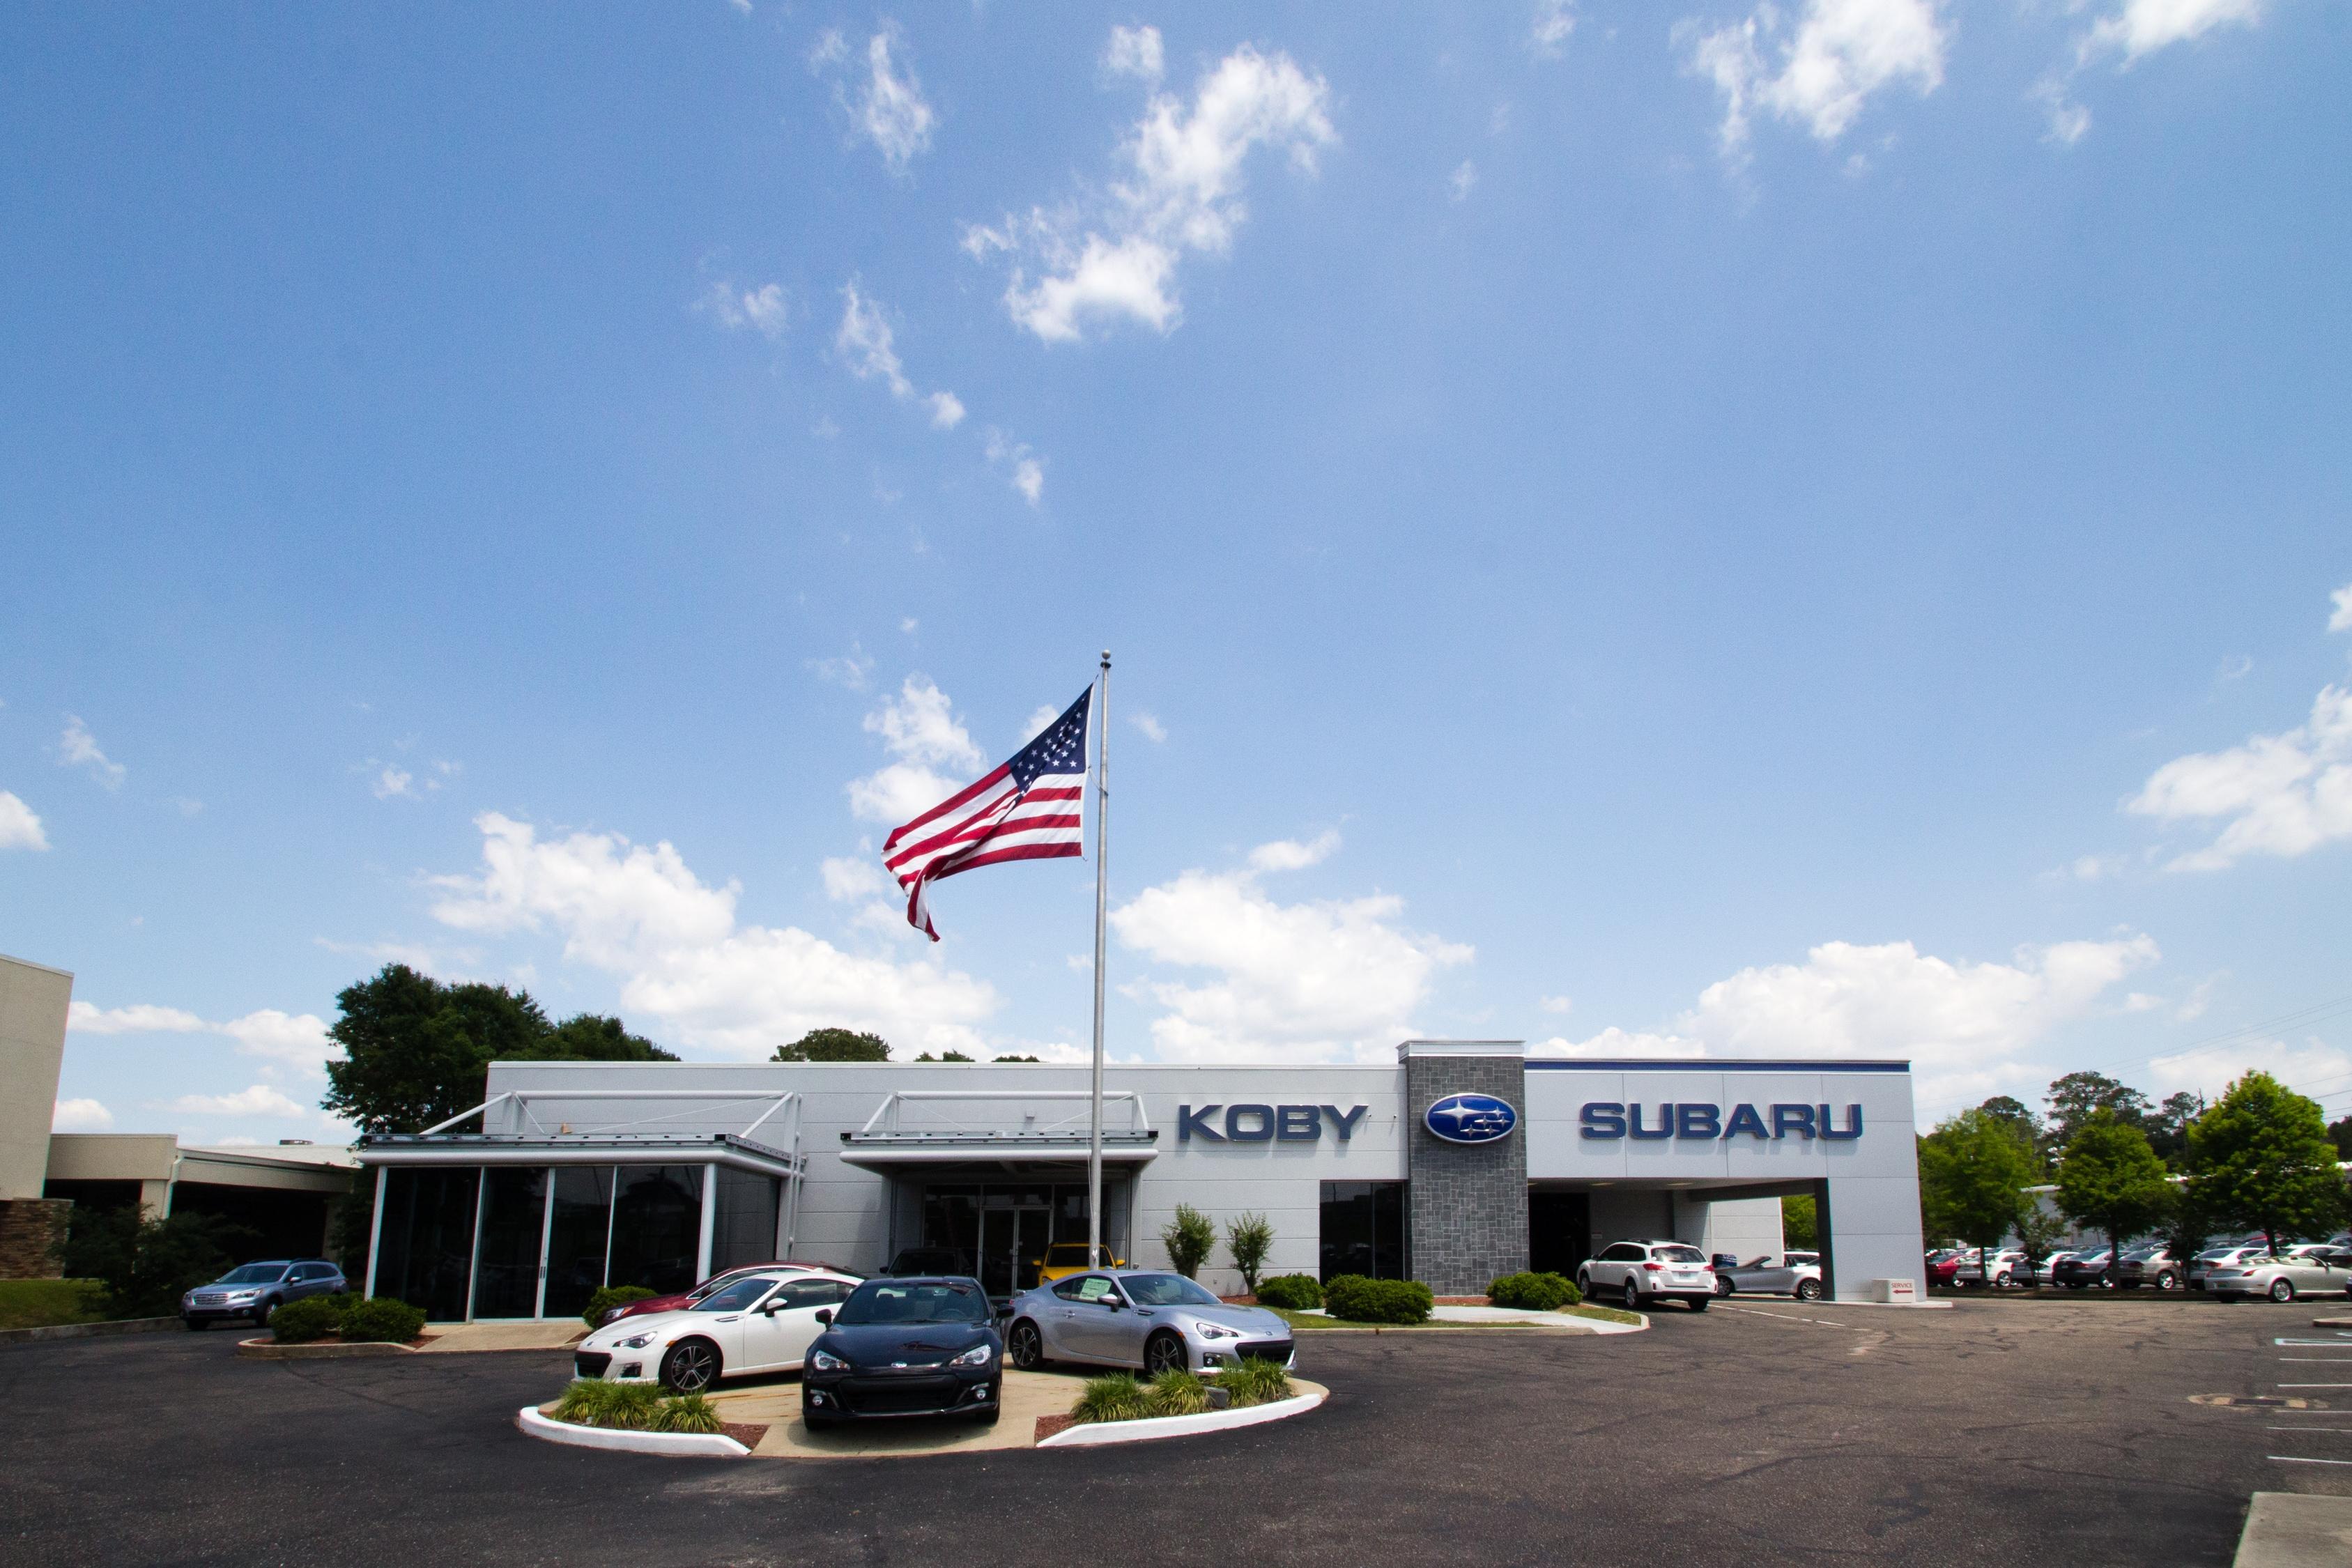 Alabama mobile county saraland - About Our Mobile Al Car Dealership New Used Subaru Dealer Near Saraland Gulfport Ms